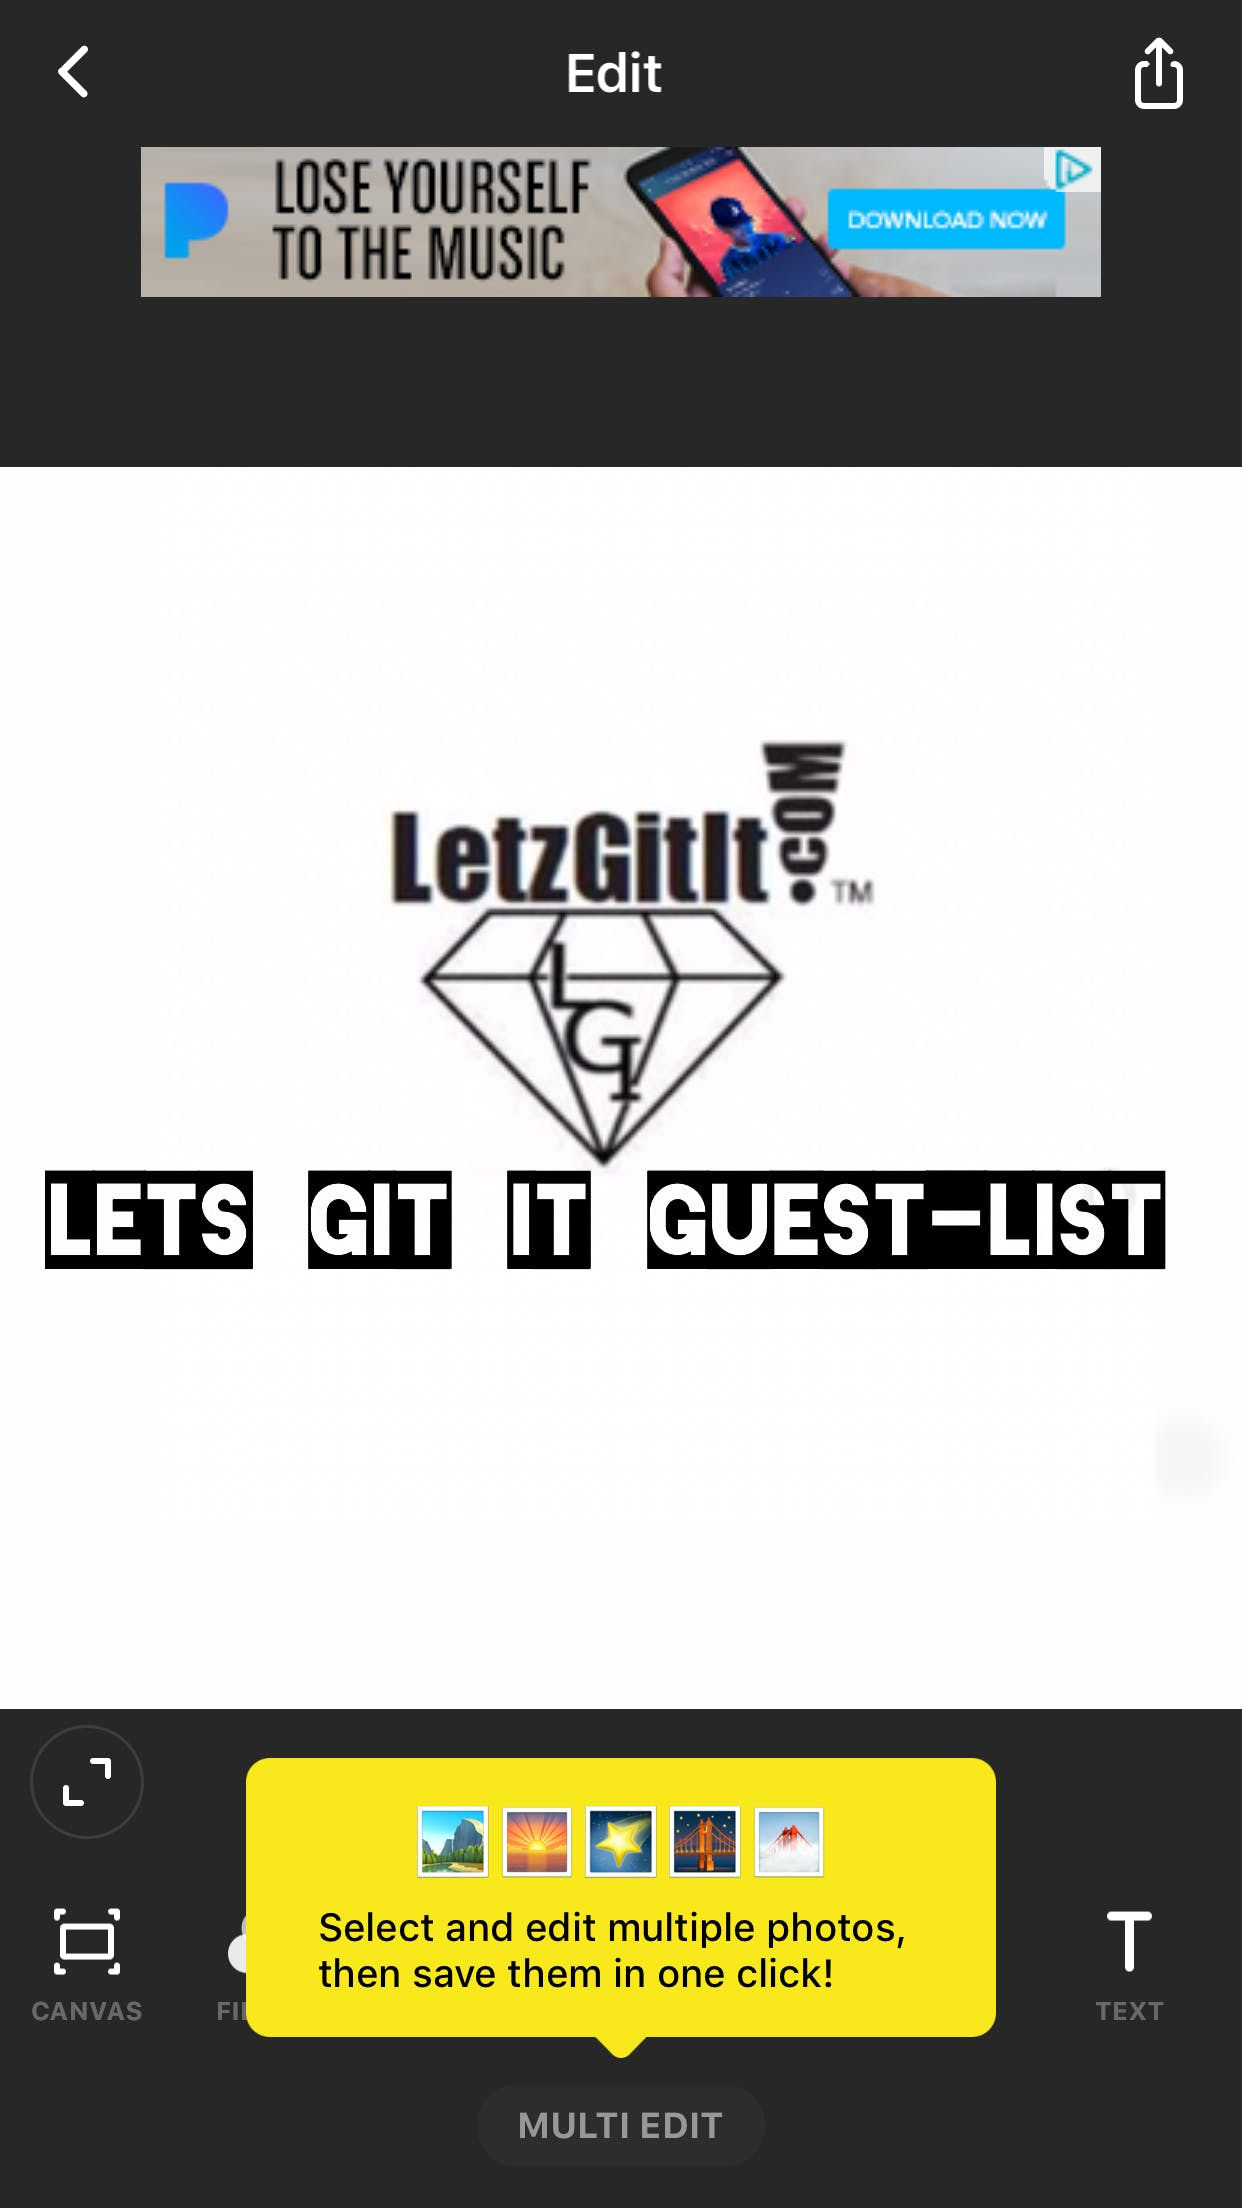 LIGHT*CHATEAU*1OAK Nightclub GUEST-LIST SPECI